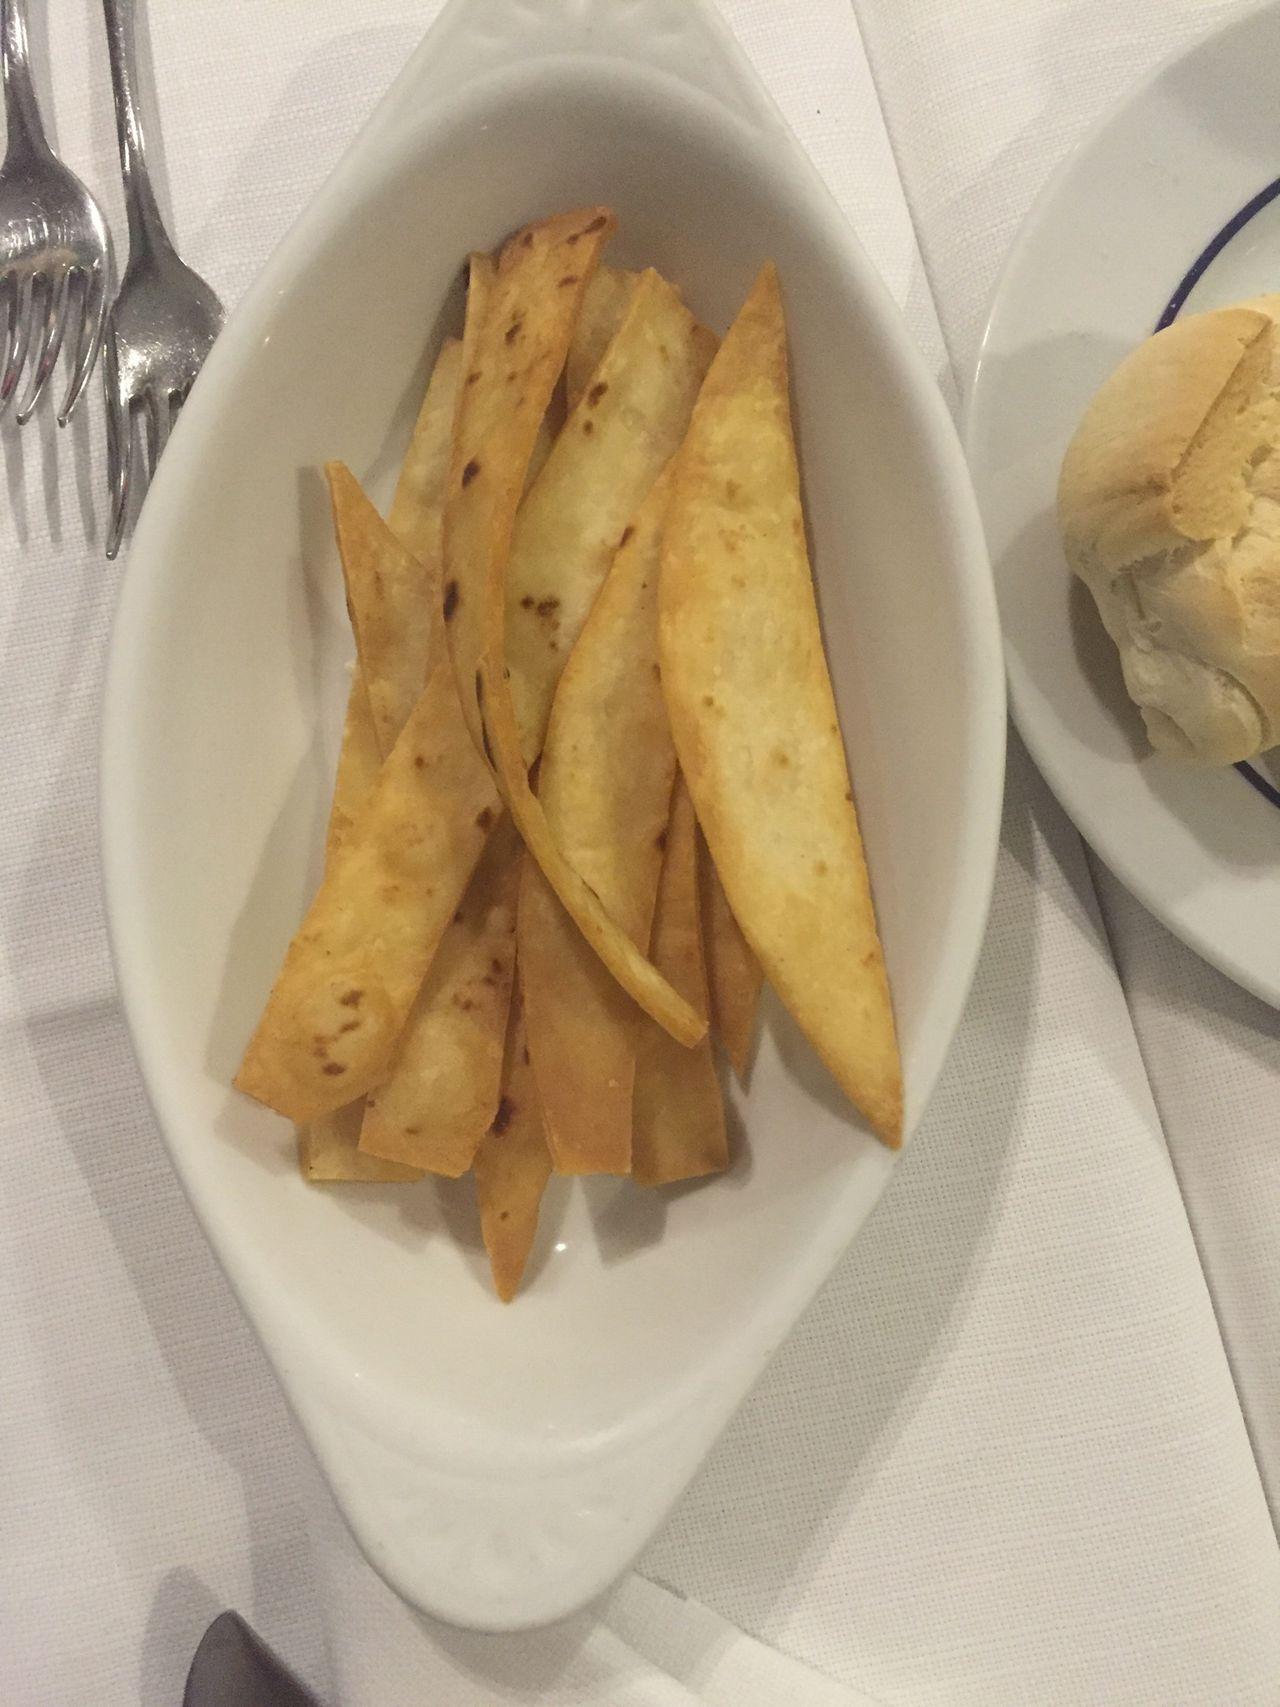 Club Náutico Restaurants Piadina Romagnola Fritta Wonderfull